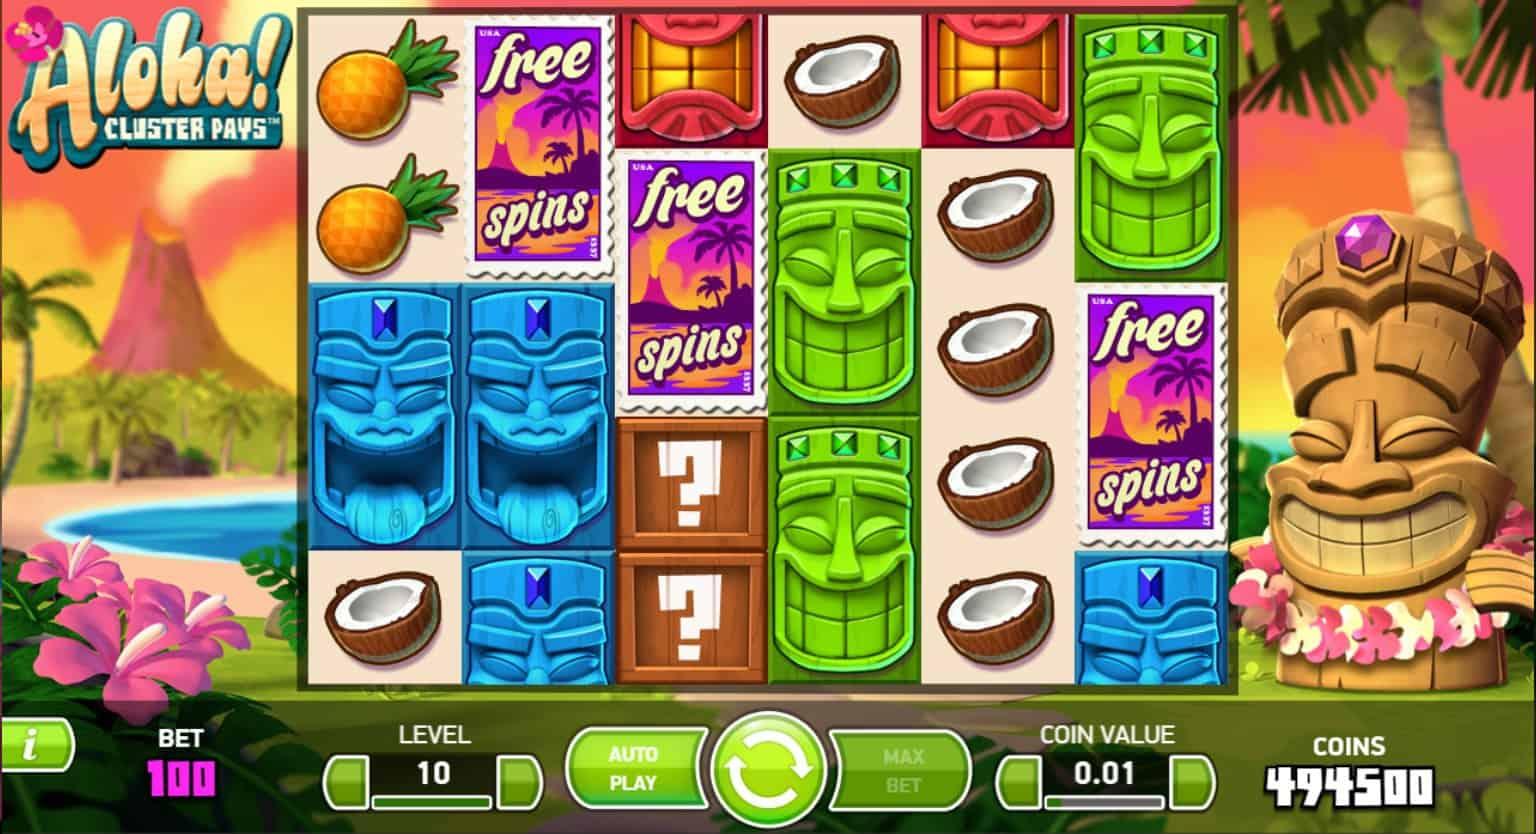 netent - aloha cluster pays - free spins base - casinogroundsdotcom